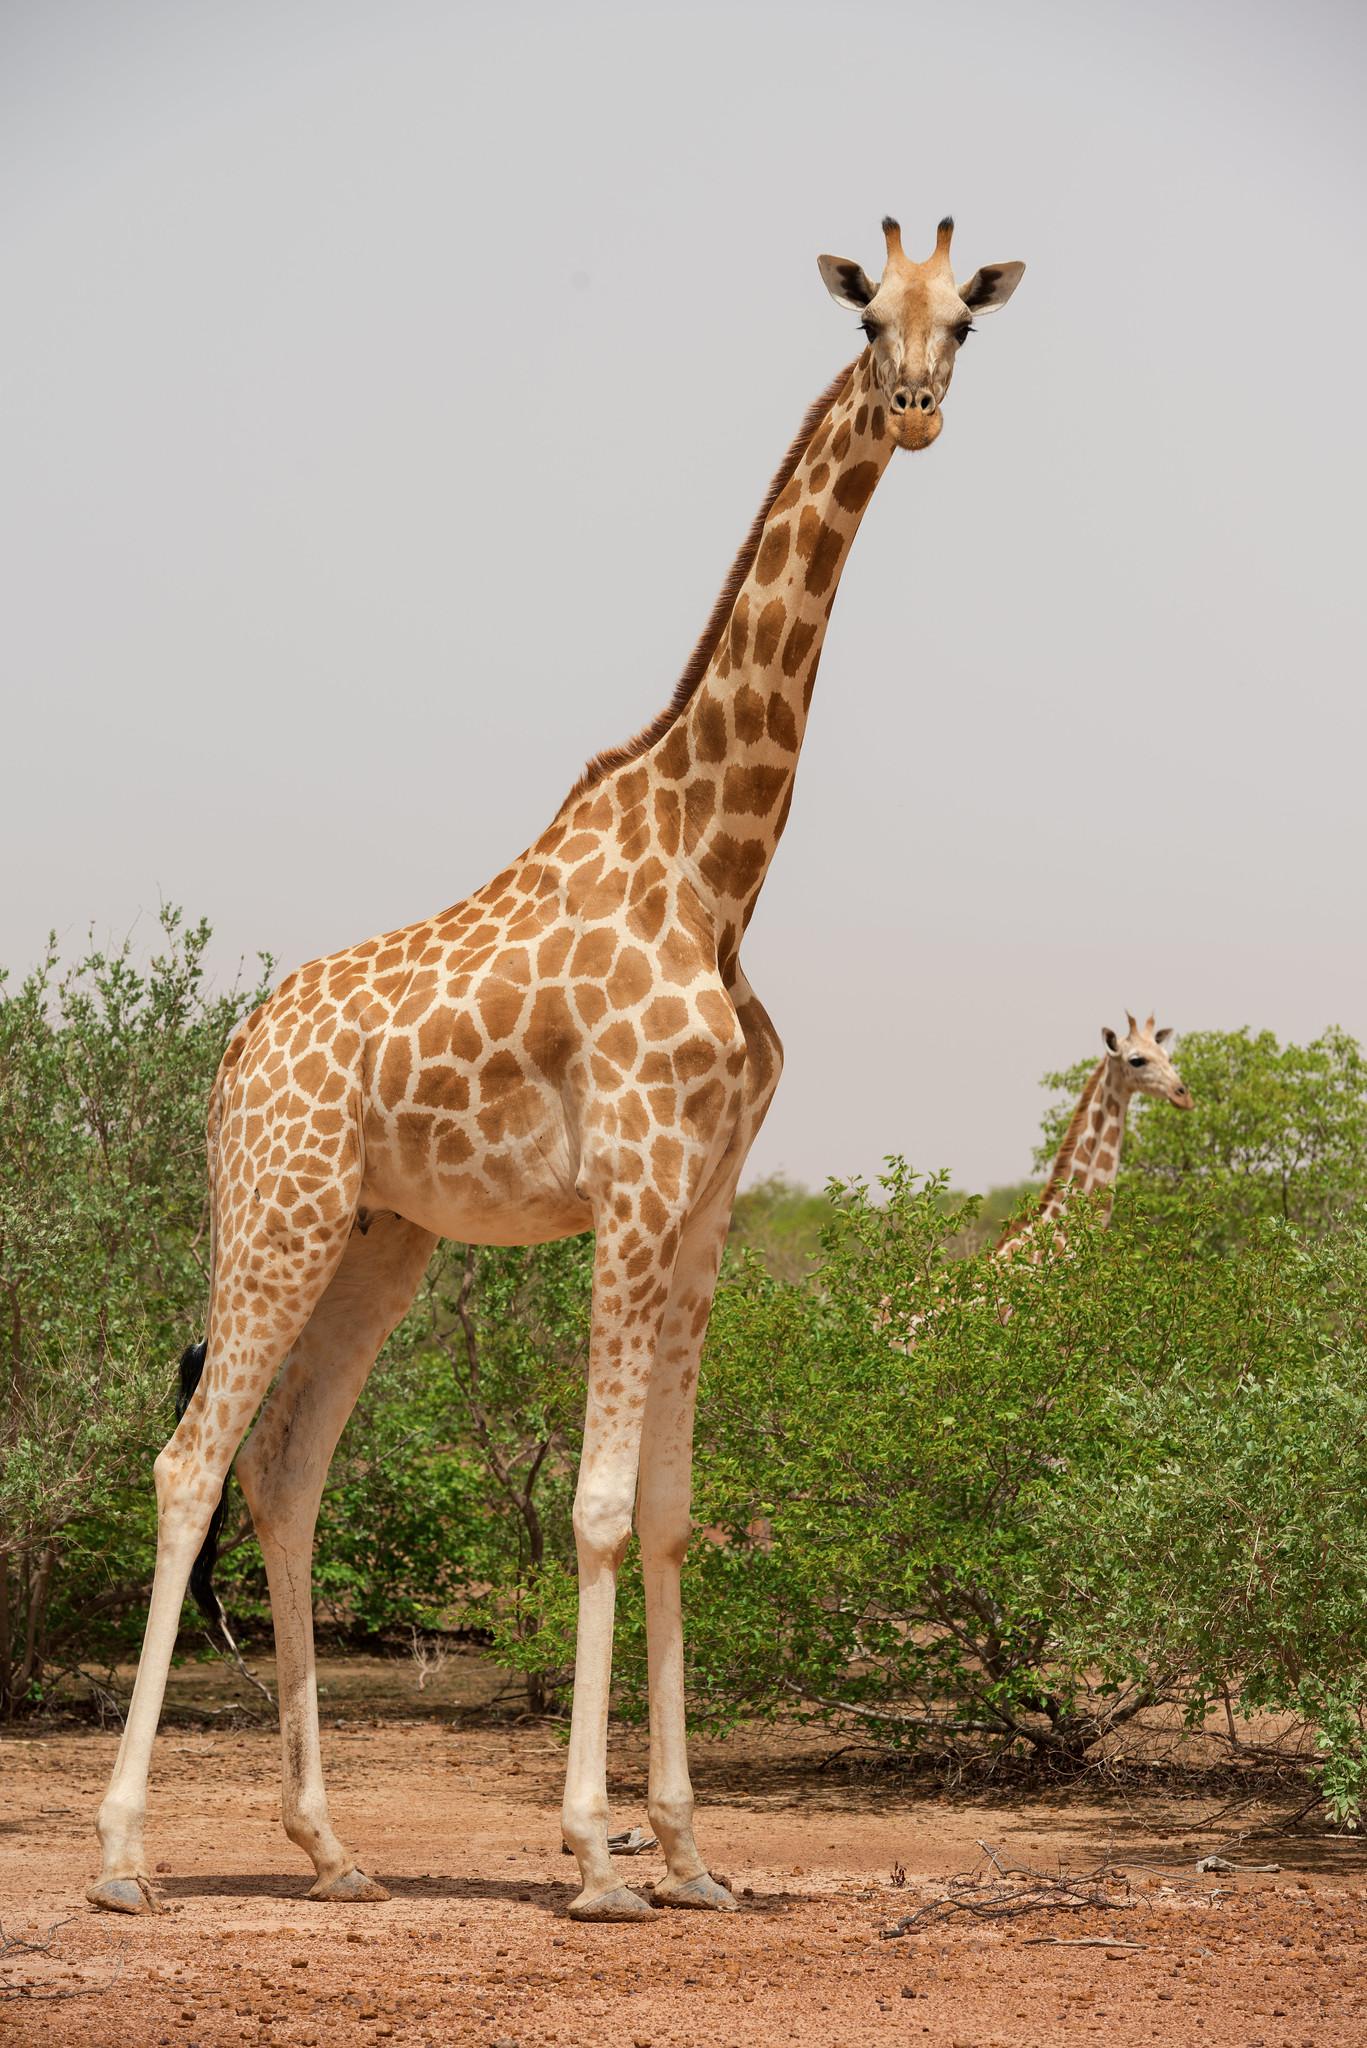 West African Giraffes in Kouré